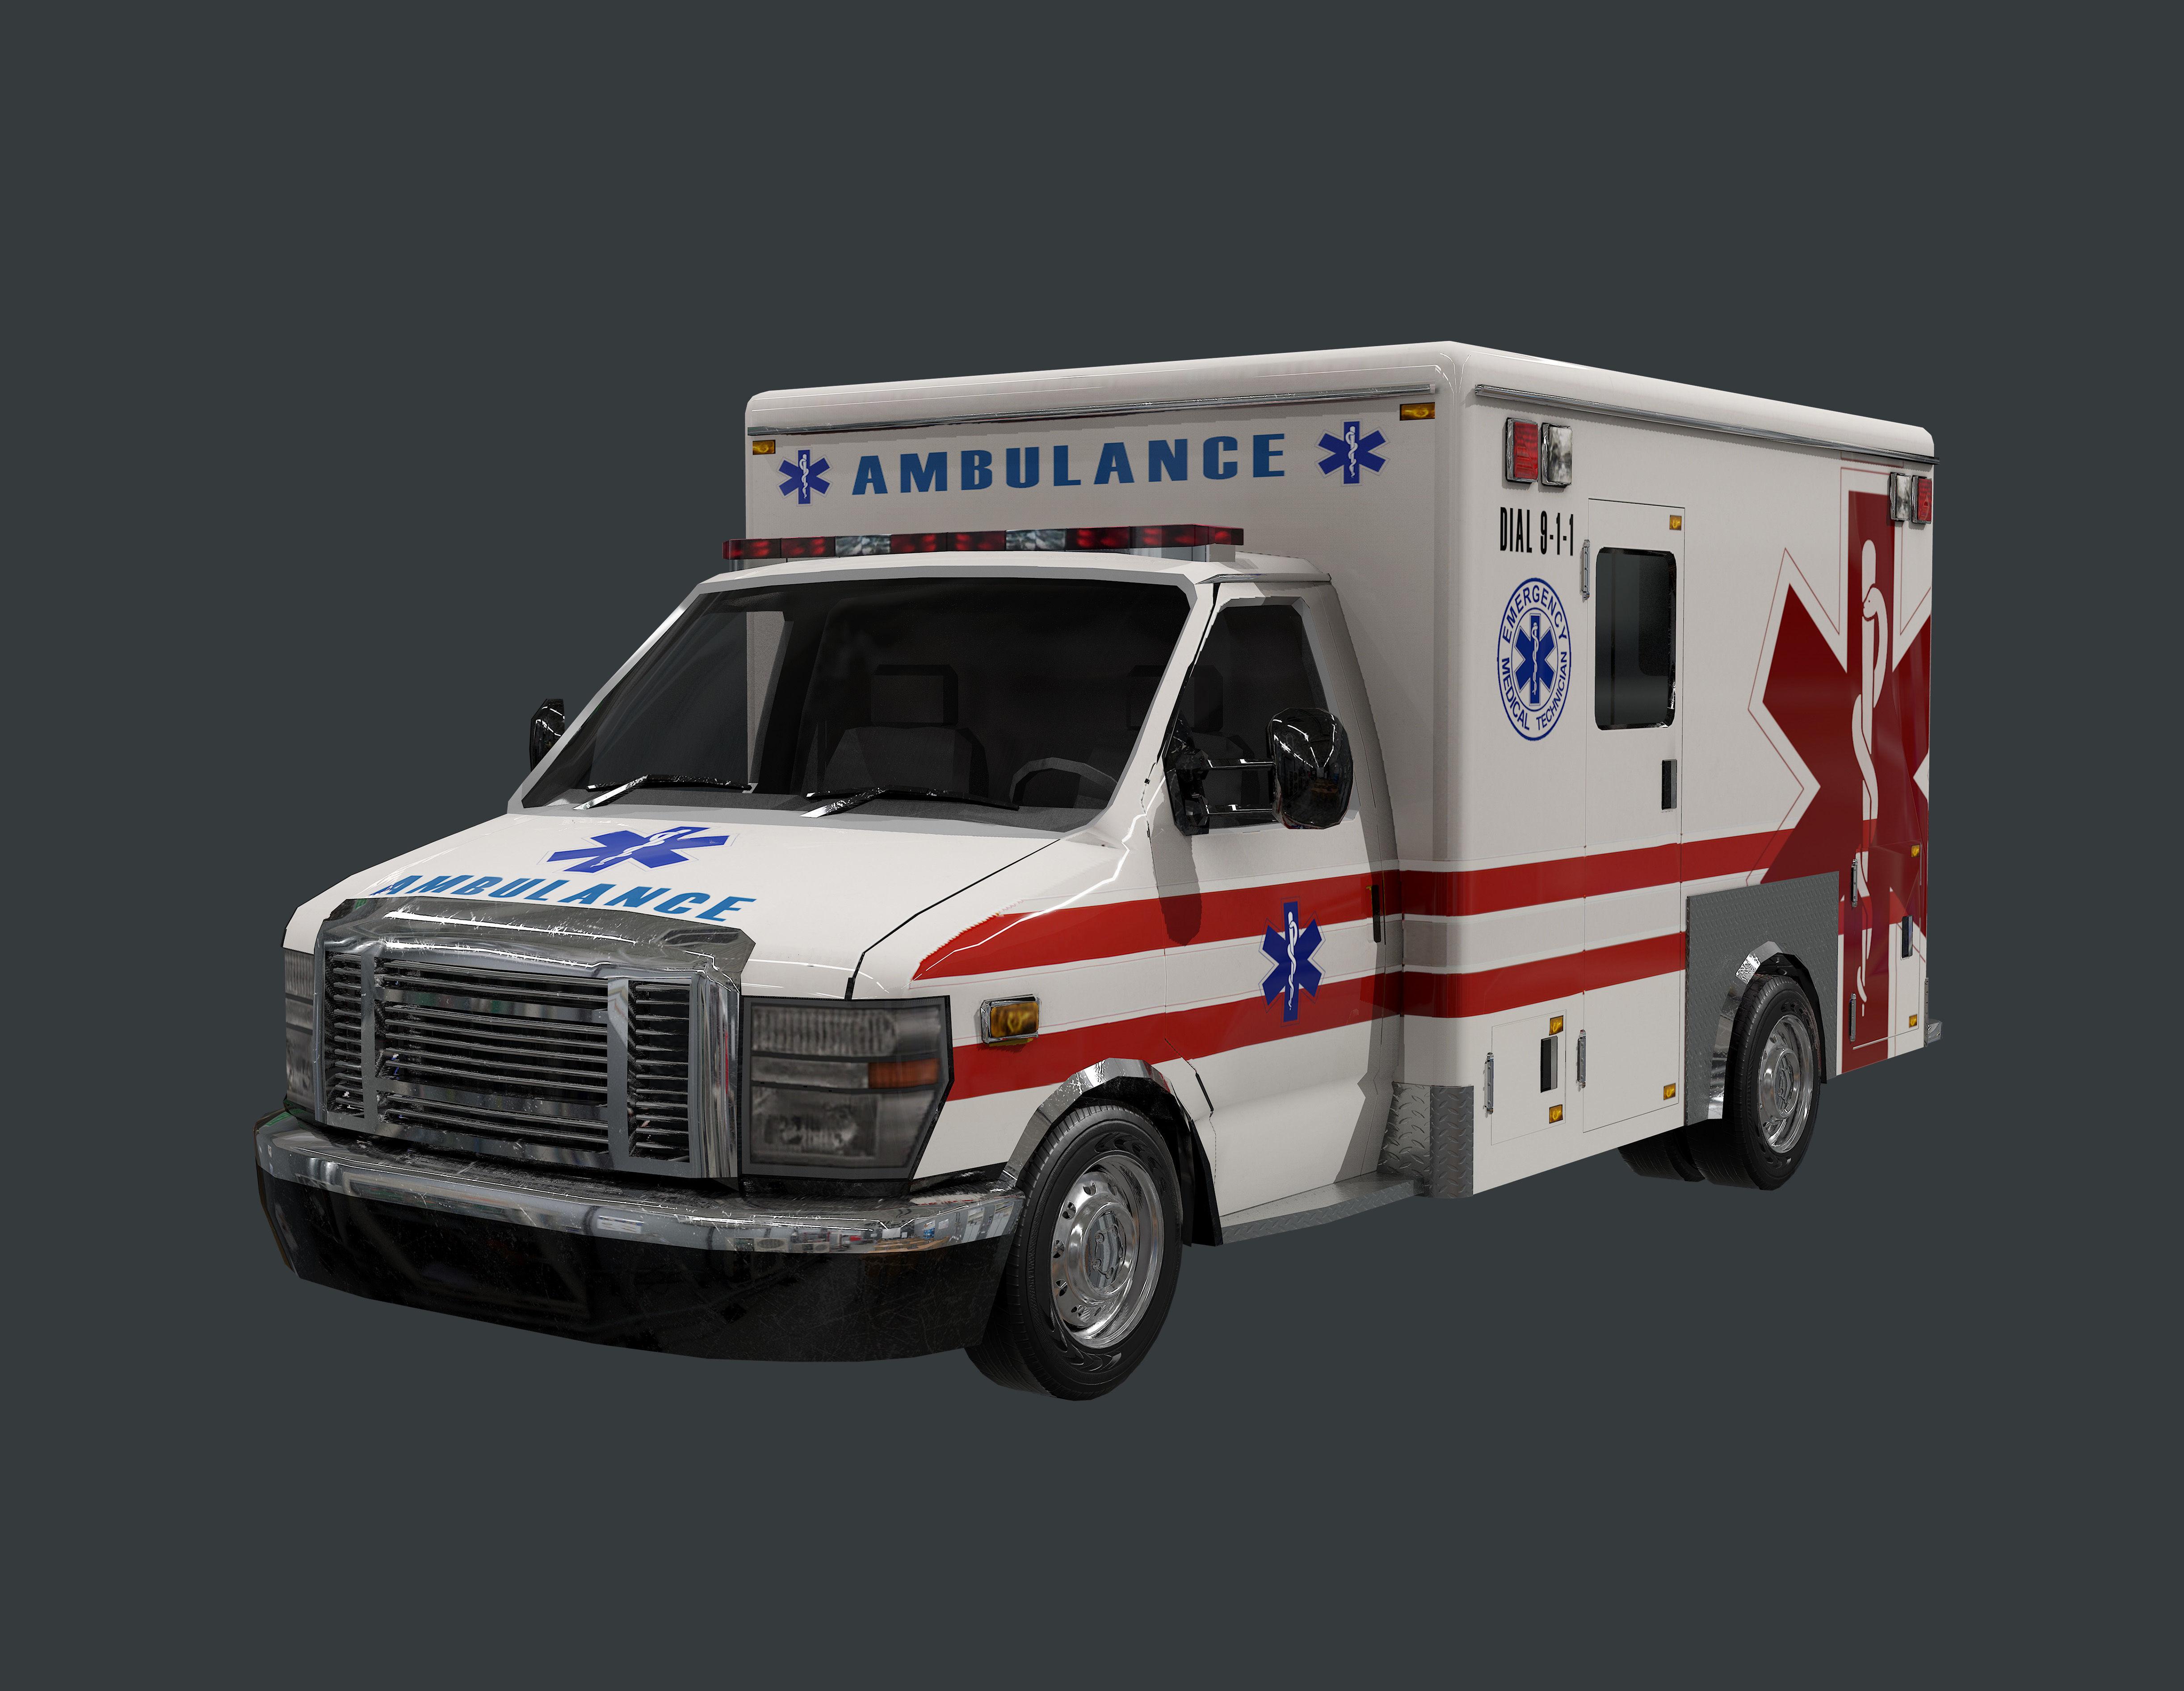 Vehicle Ambulance Rescue Truck Game Ready 05